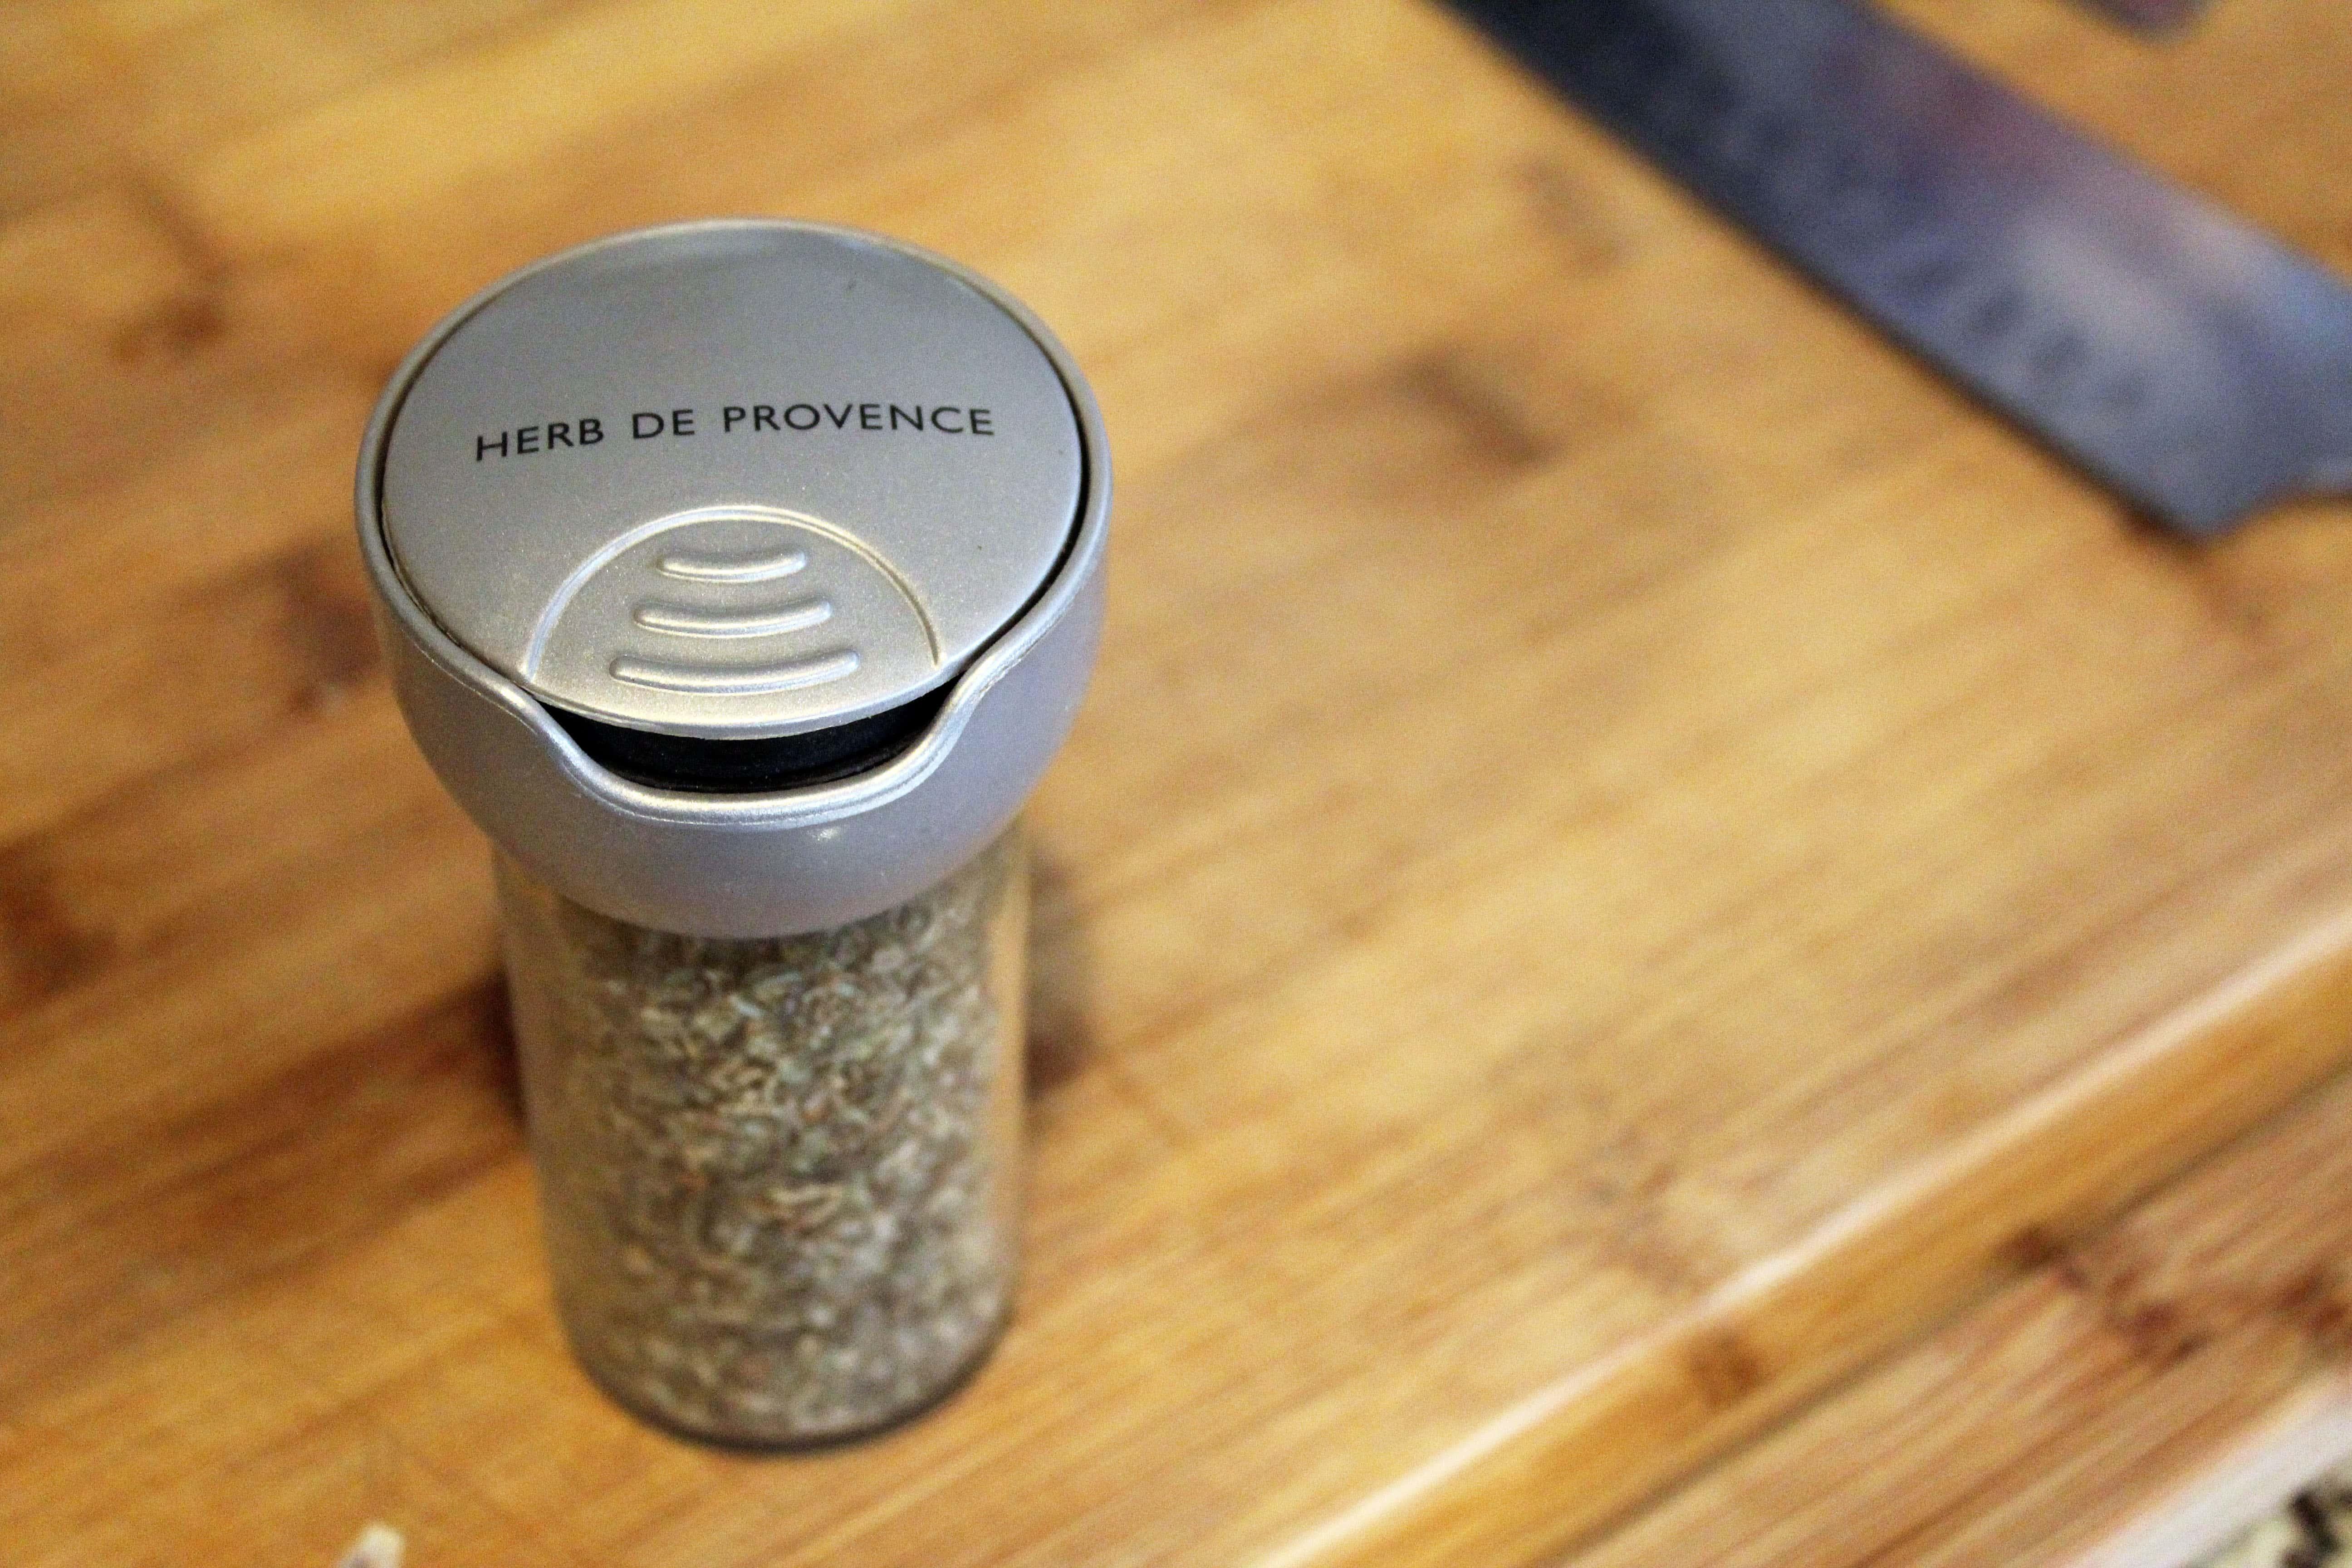 Add herbs de provence